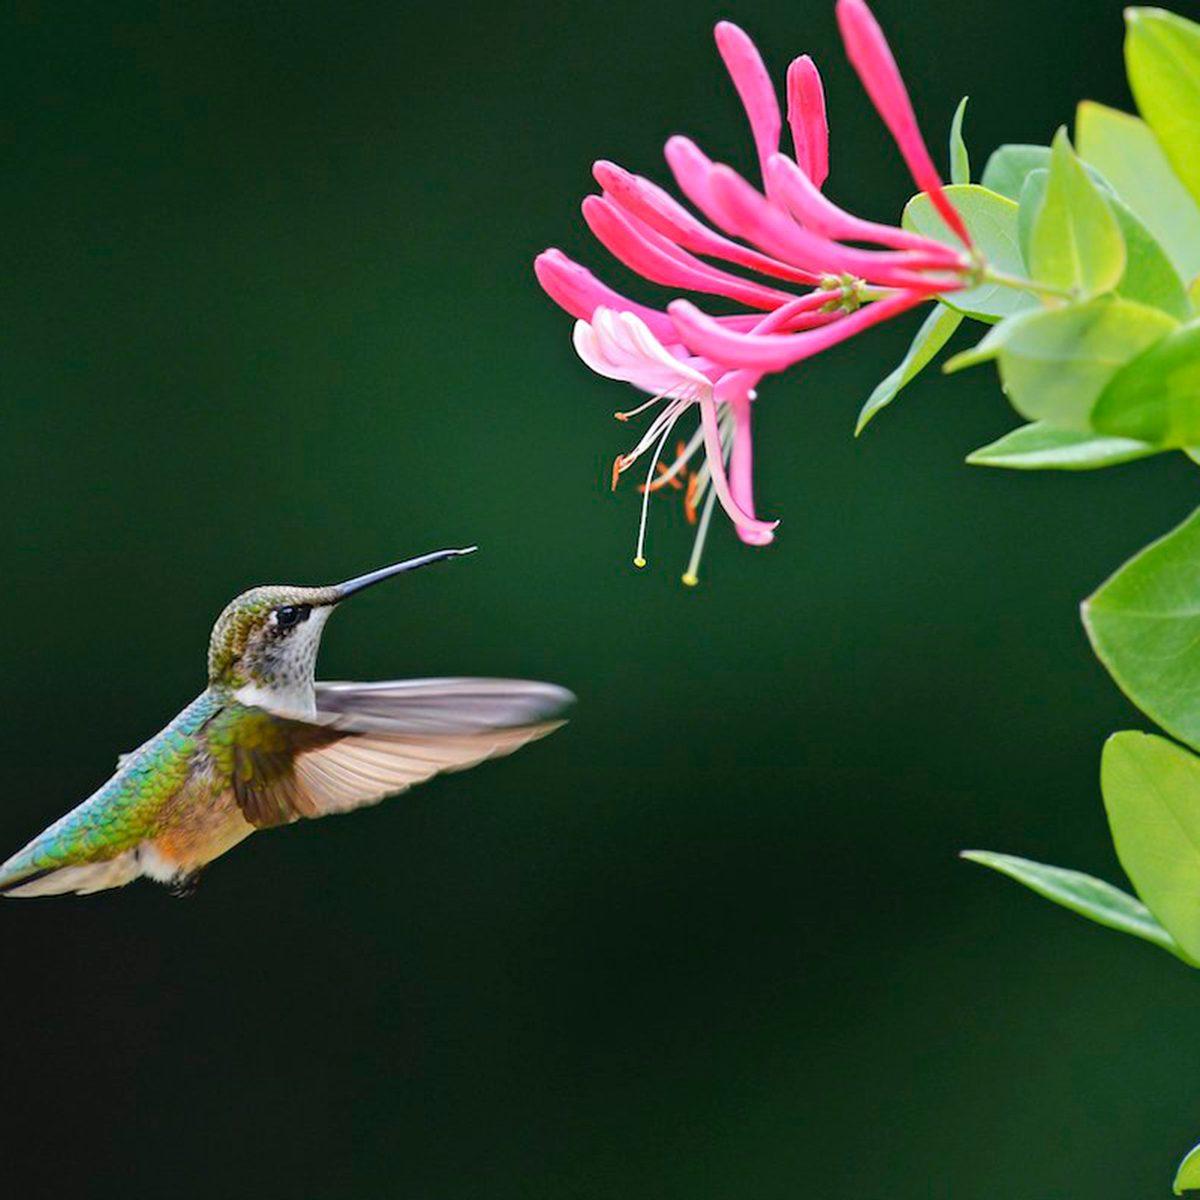 Hummingbird hovering by honeysuckle flower